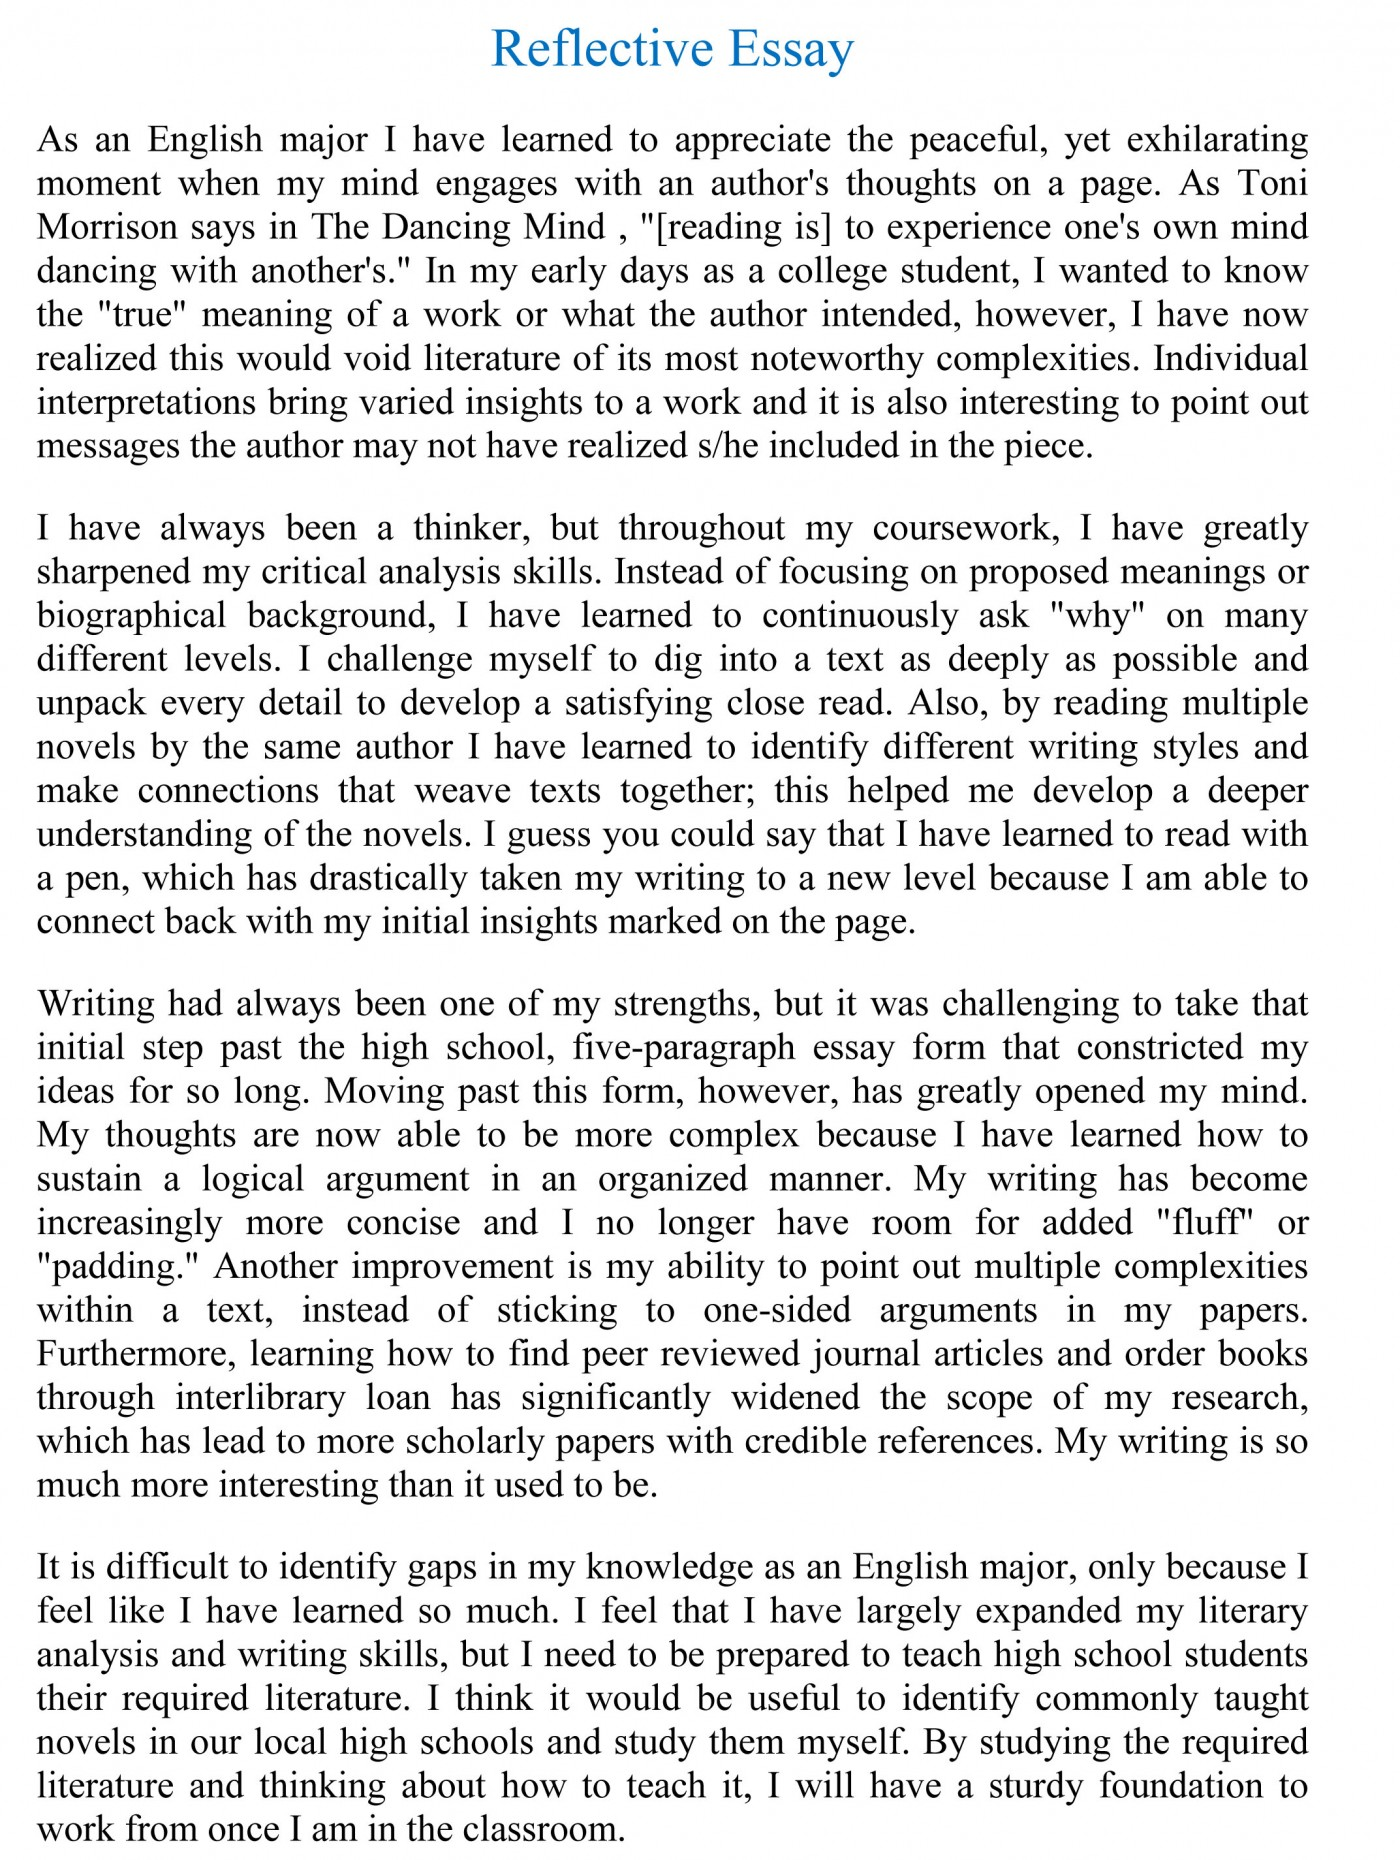 003 Reflective Essay Introduction Example Unbelievable Academic Good 1400